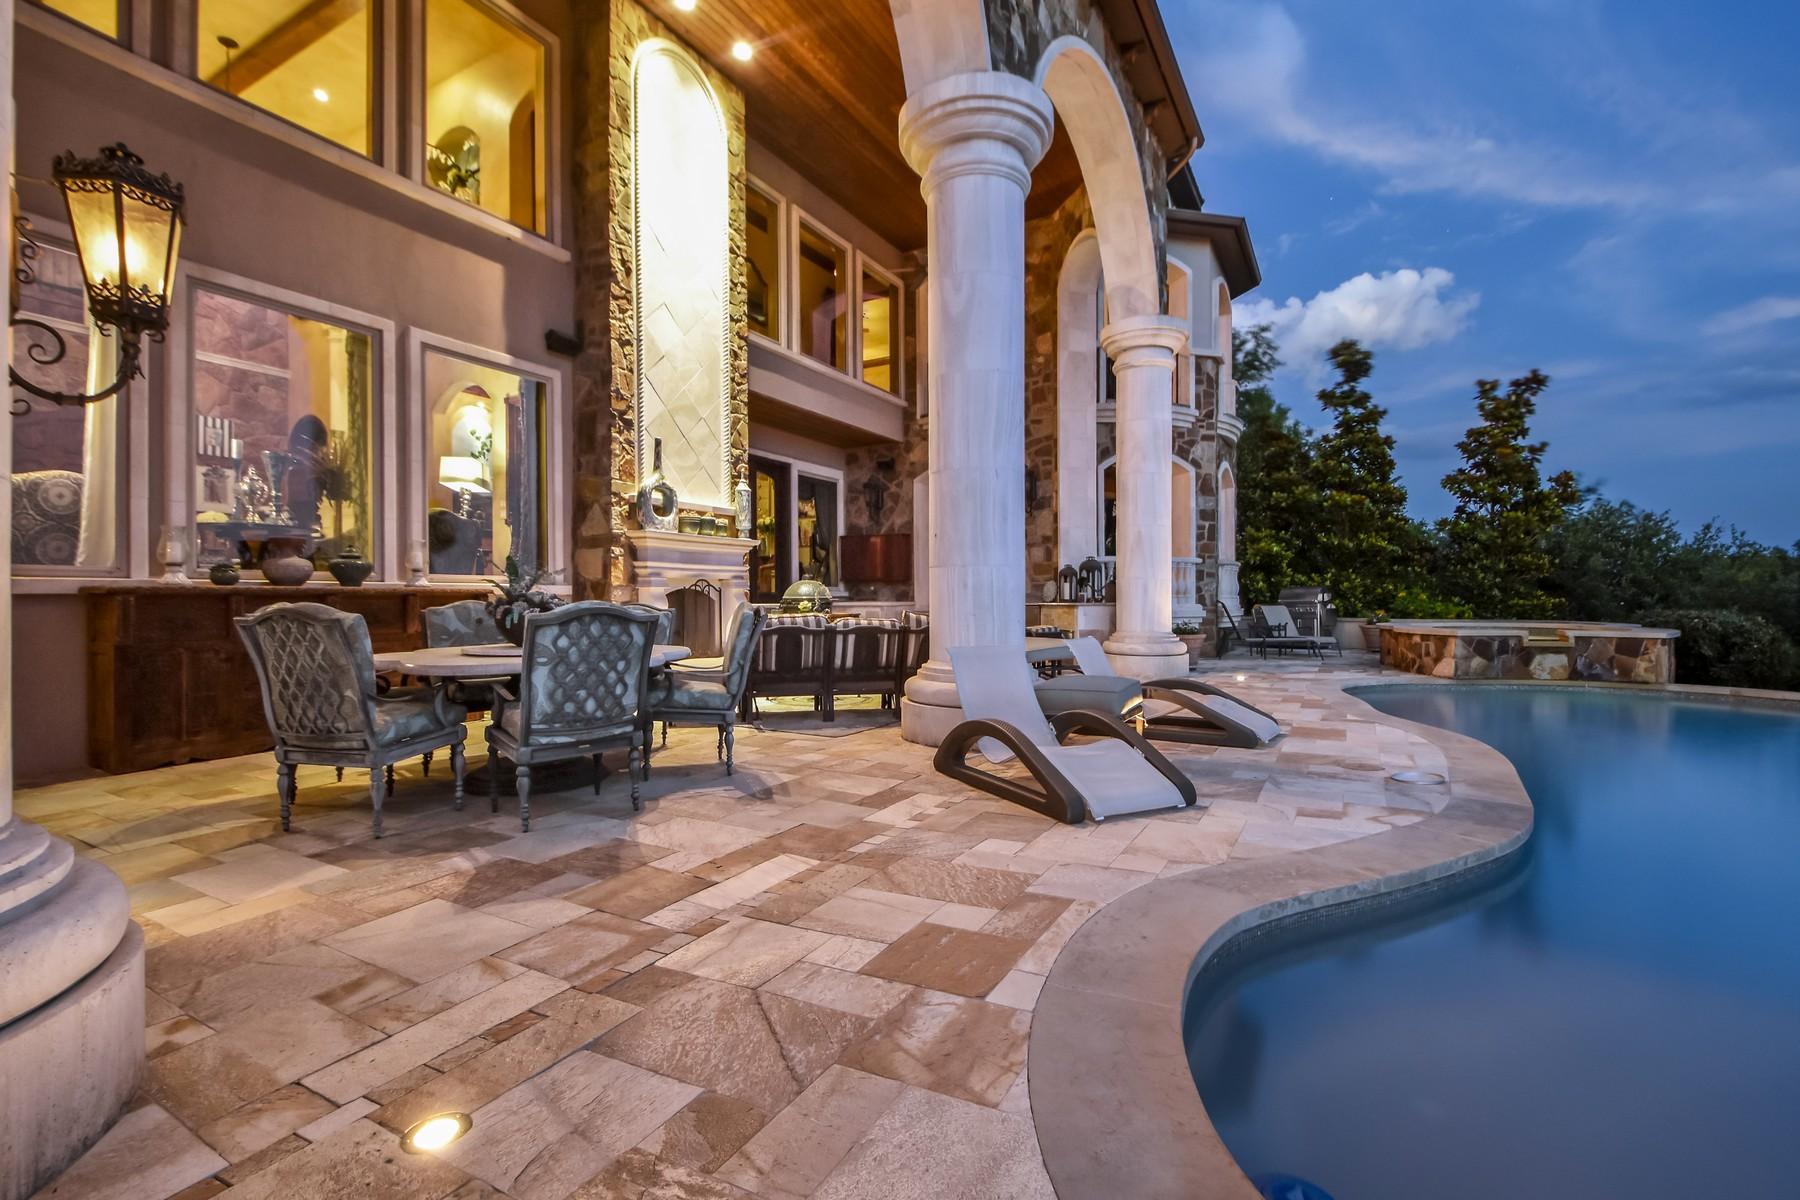 Additional photo for property listing at Tuscan Villa with Amazing Lake Travis Views 8319 Lime Creek Rd Austin, Texas 78641 Estados Unidos